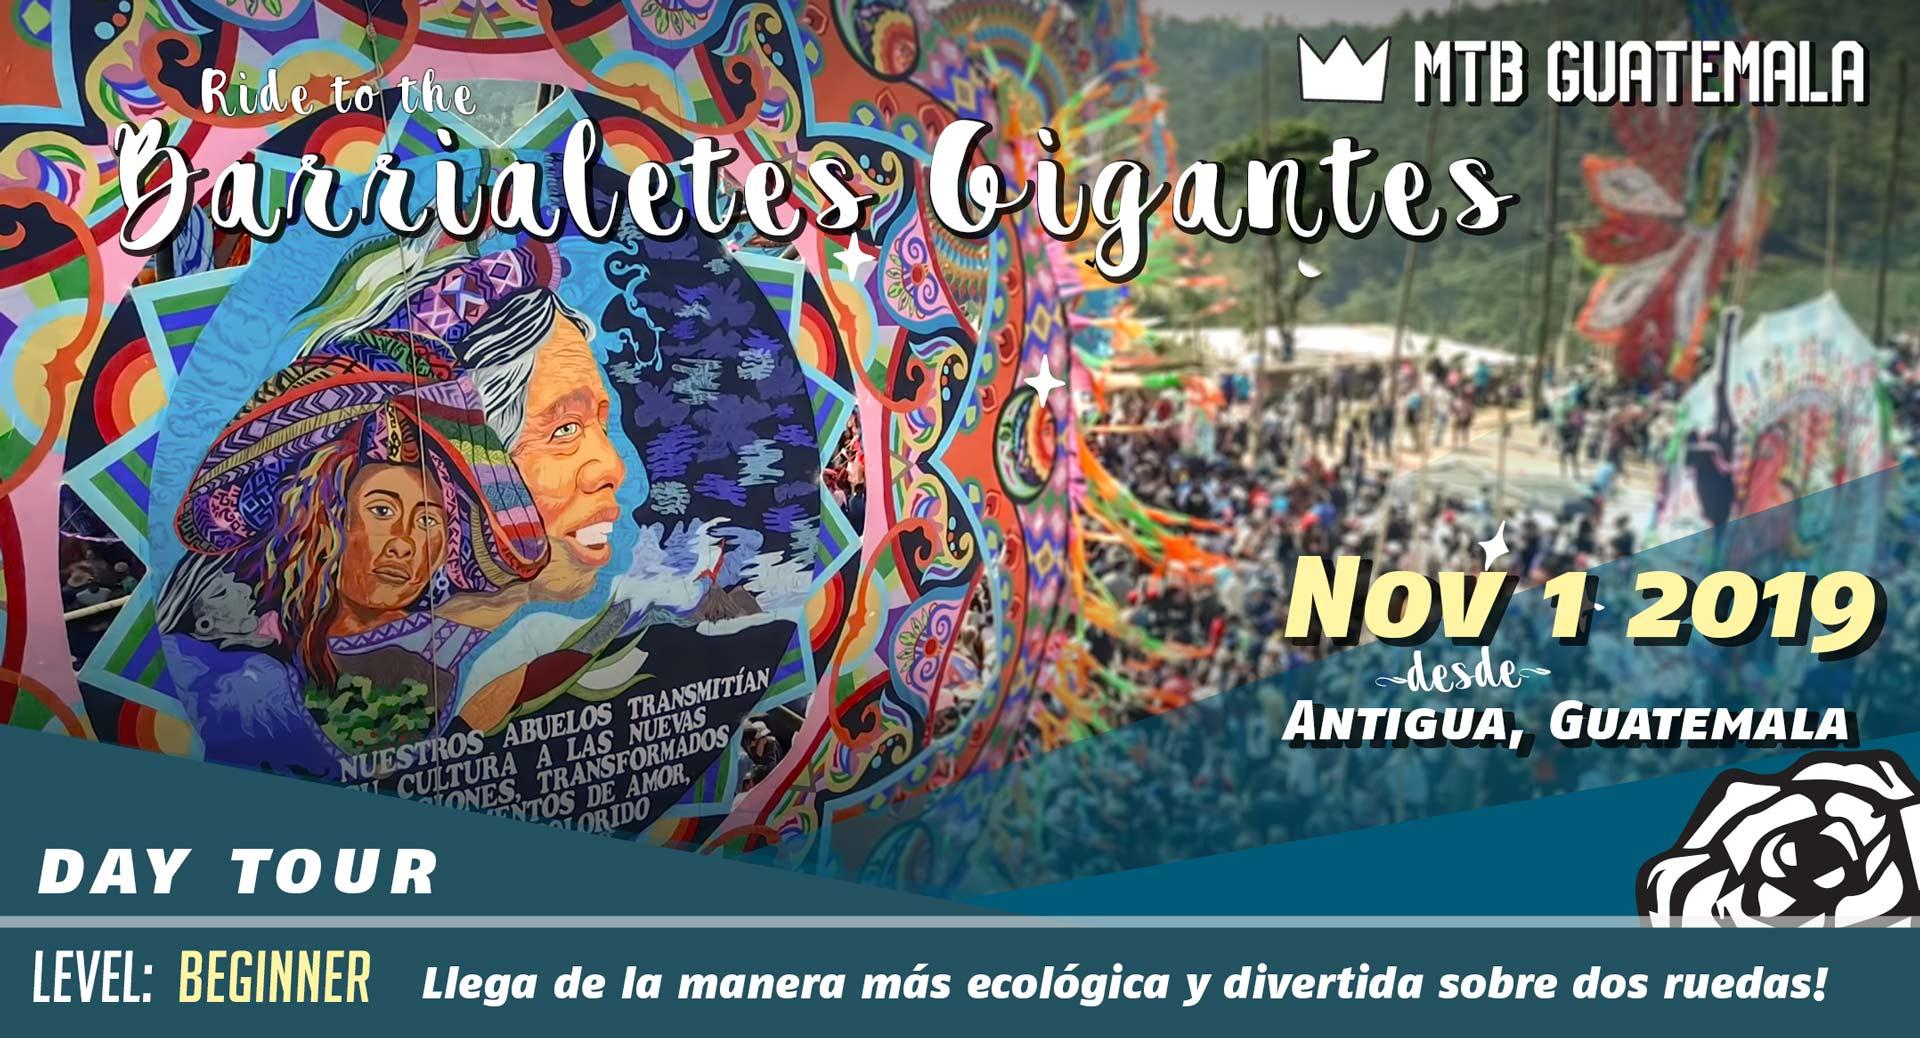 Mountain Bike to the Festival de Barriletes Gigantes Sumpango